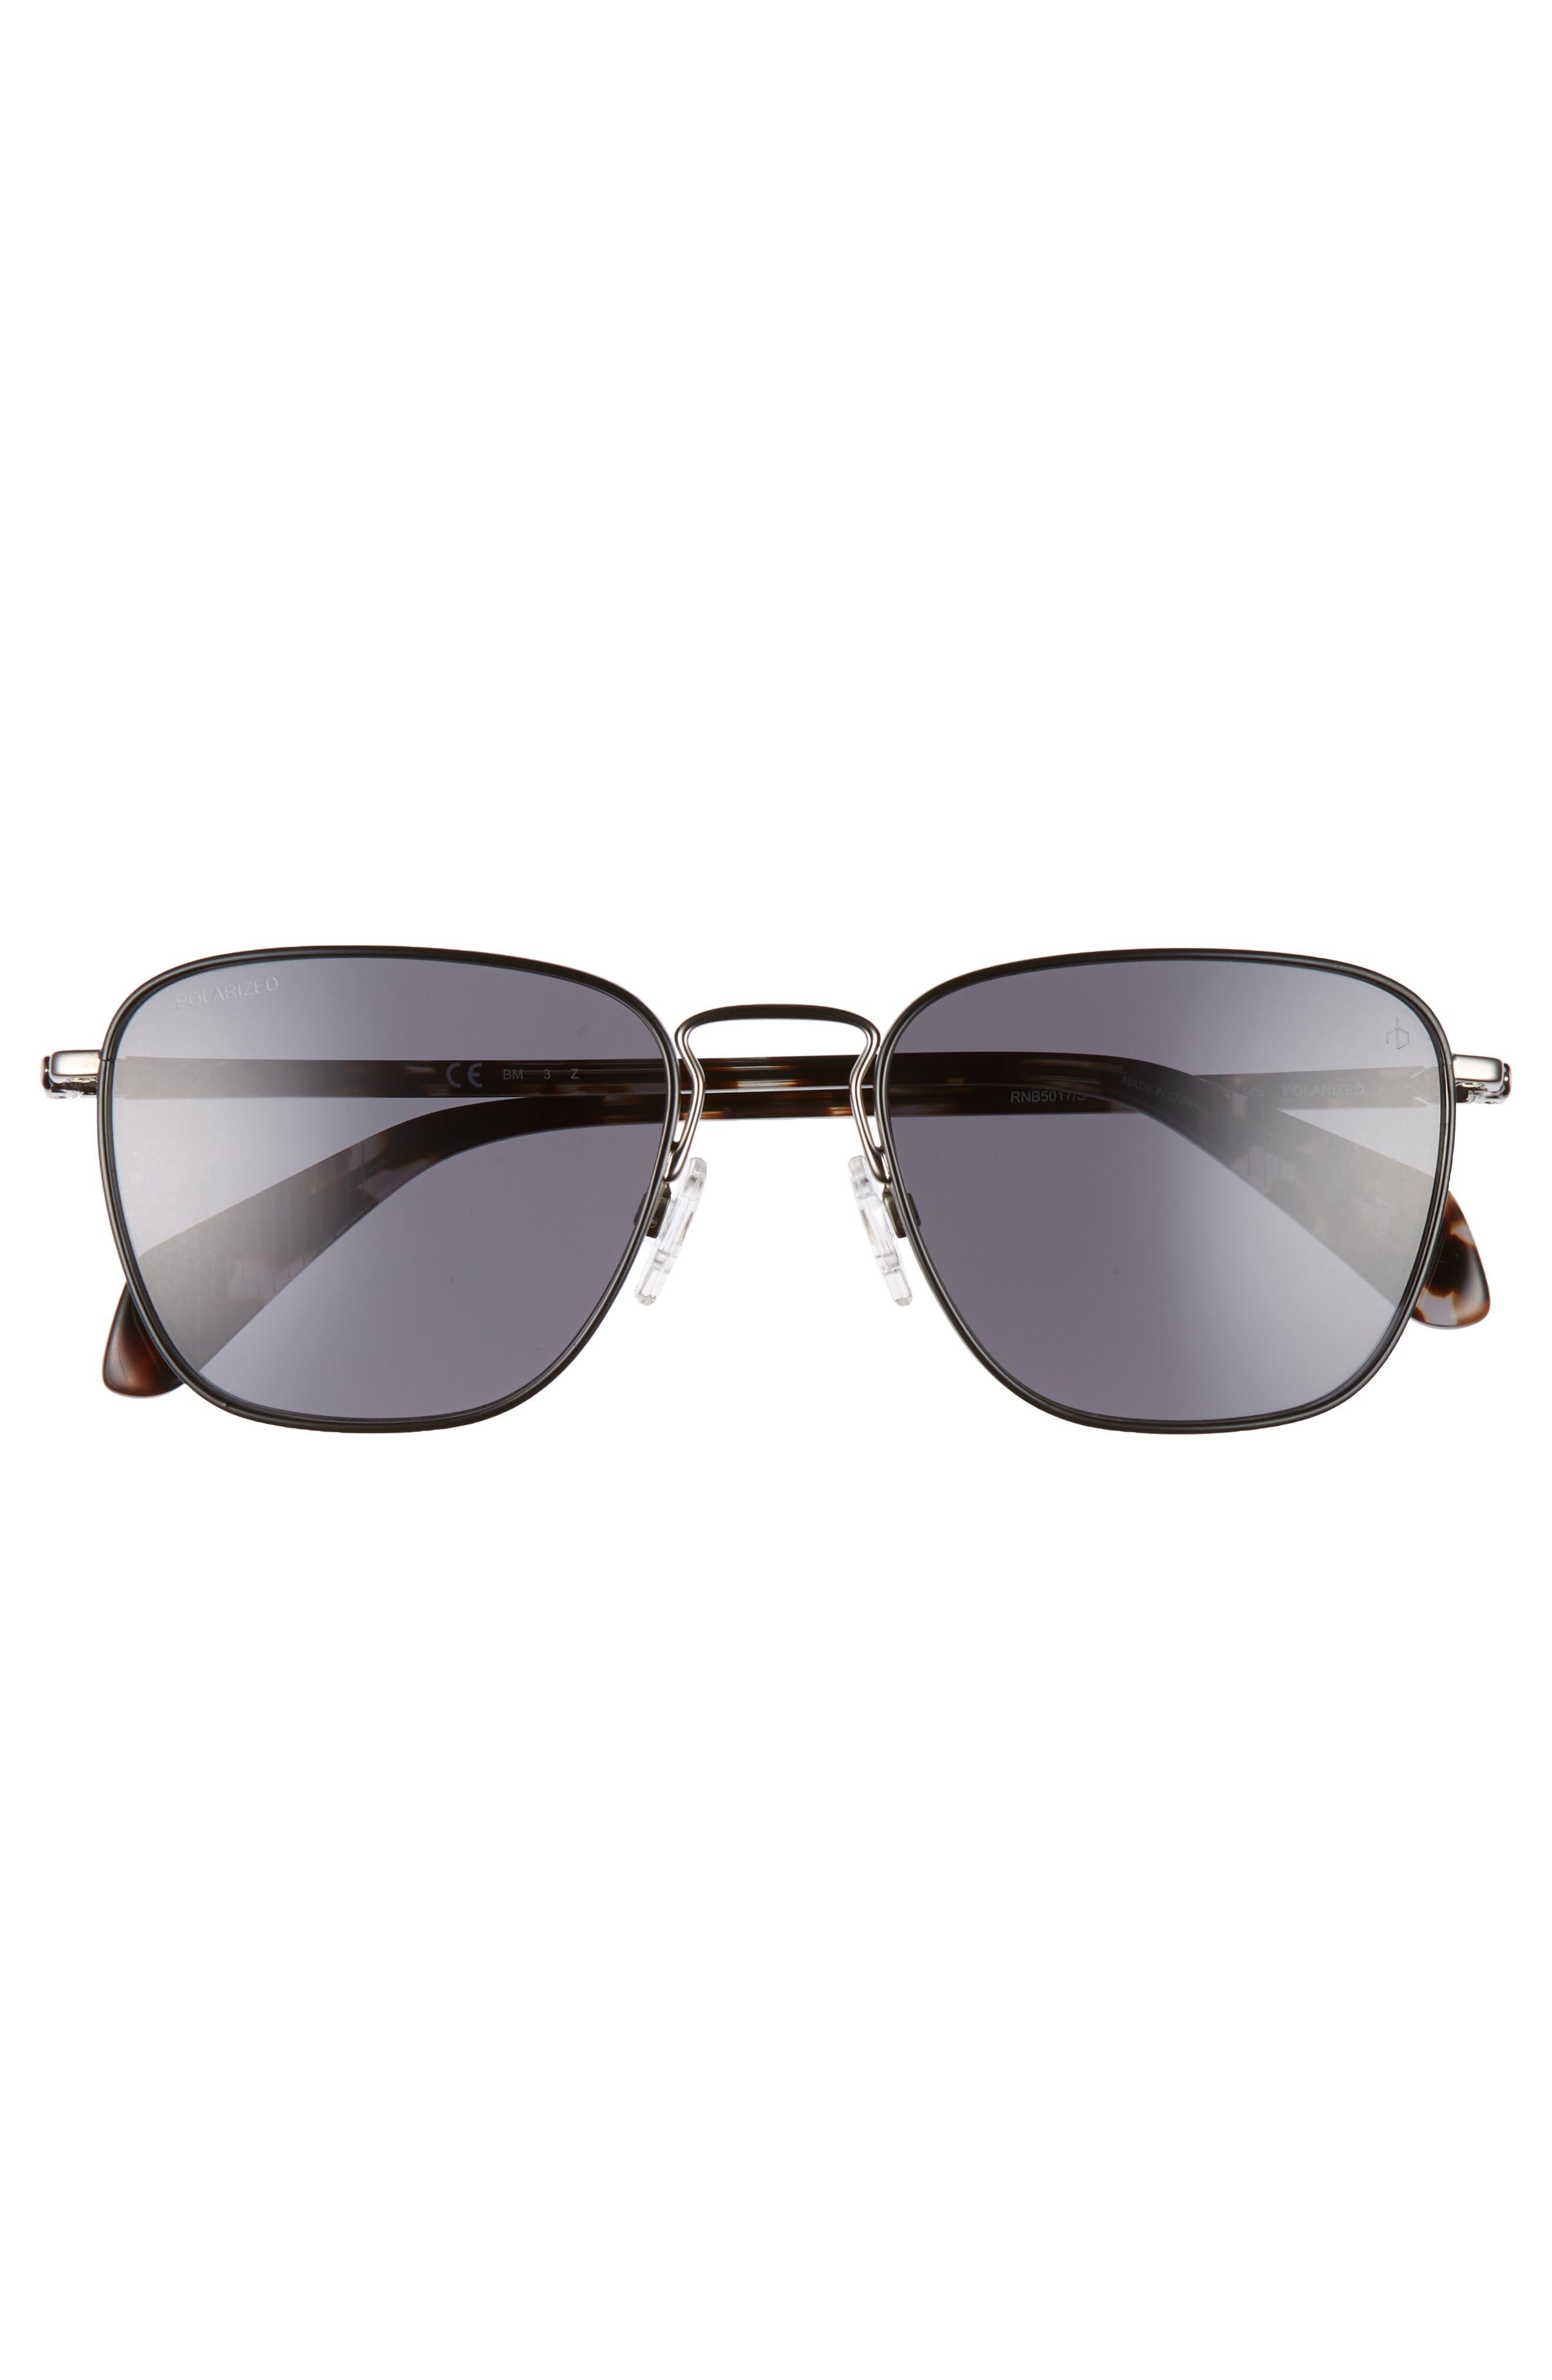 54mm Polarized Aviator Sunglasses,                             Alternate thumbnail 3, color,                             DARK RUTHENIUM/ BLACK